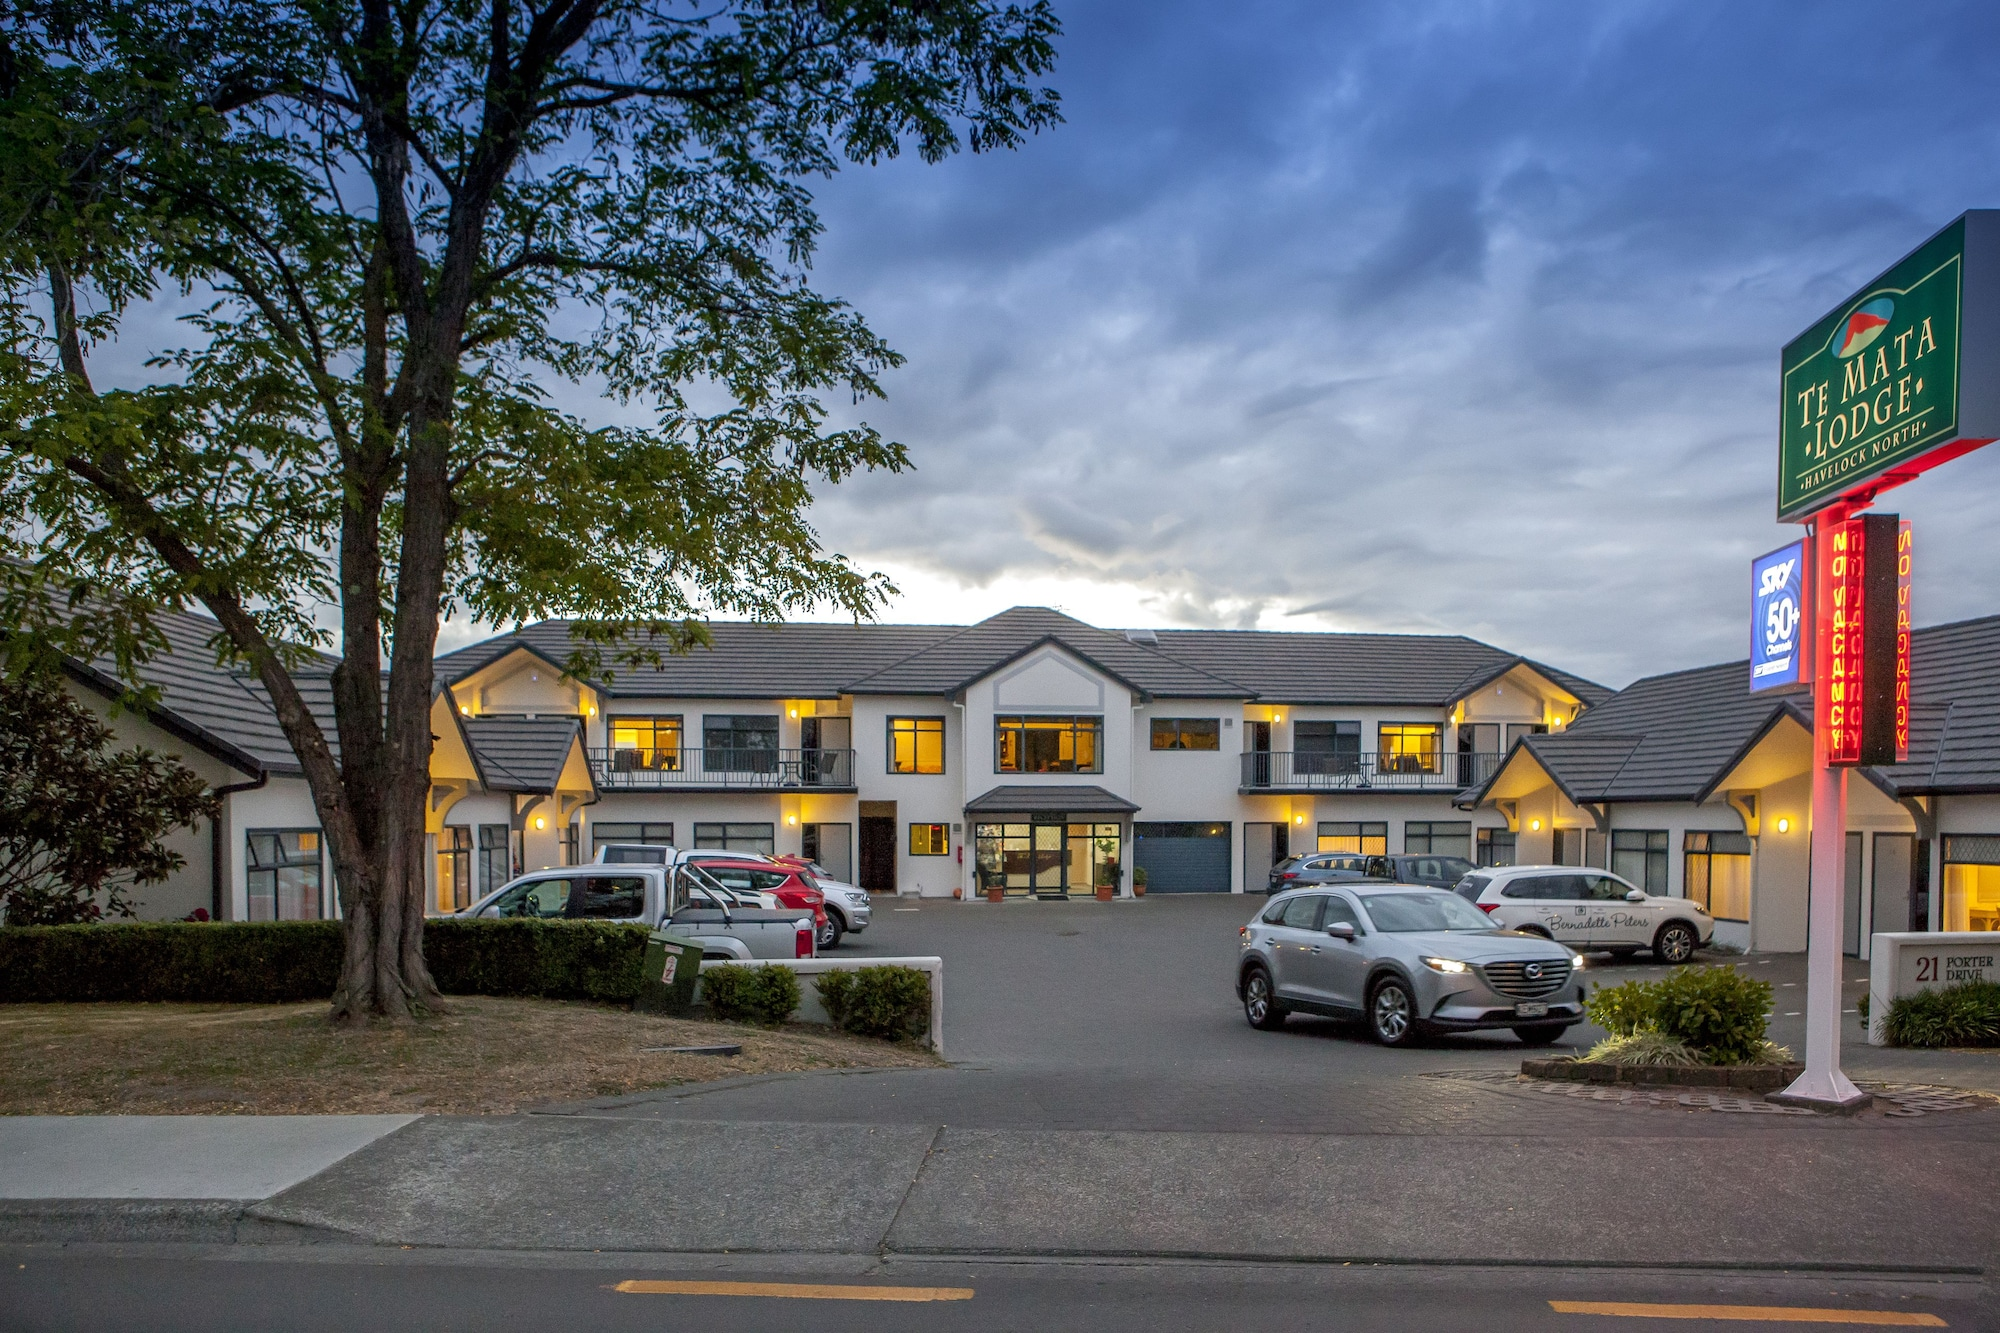 Te Mata Lodge, Hastings city